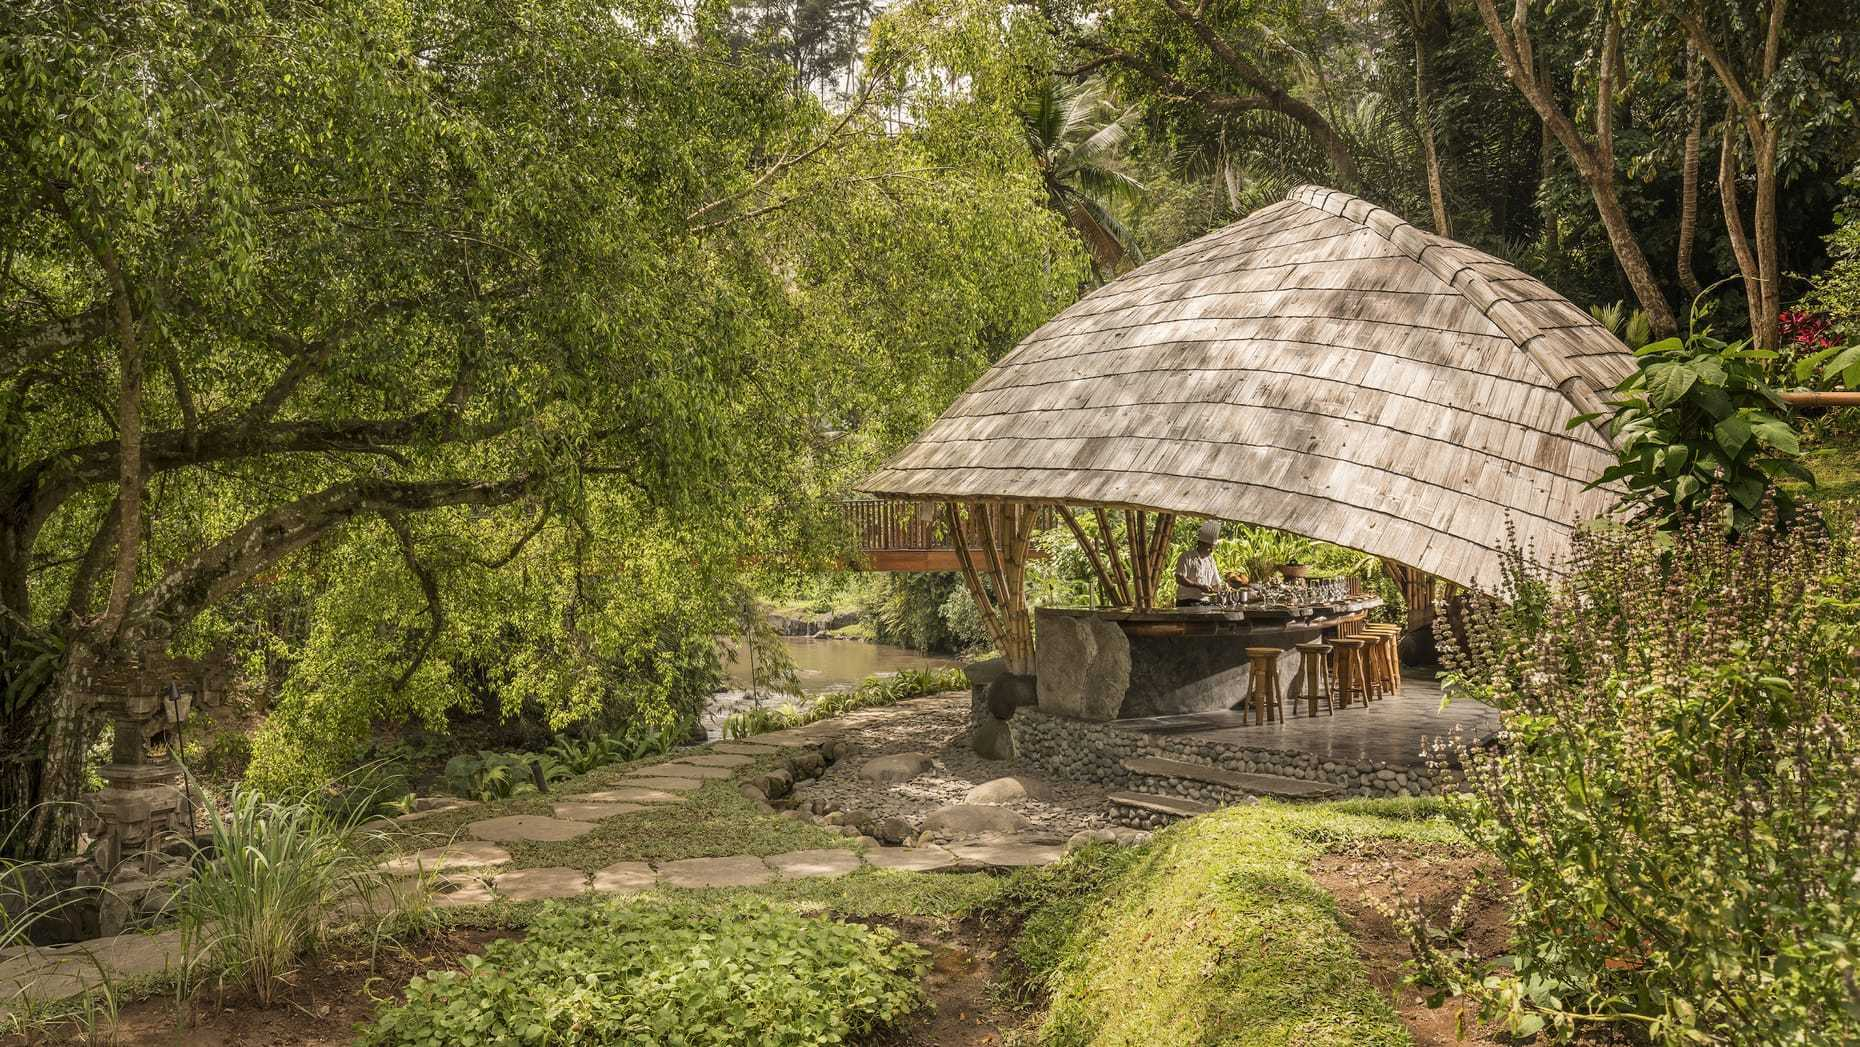 Agung Budi Raharsa | Architecture & Engineering Sokasi Bamboo Cooking Class / School - Bali Bali, Indonesia Bali, Indonesia Agung-Budi-Raharsa-Sokasi-Cooking-Class-School-Bali  88747